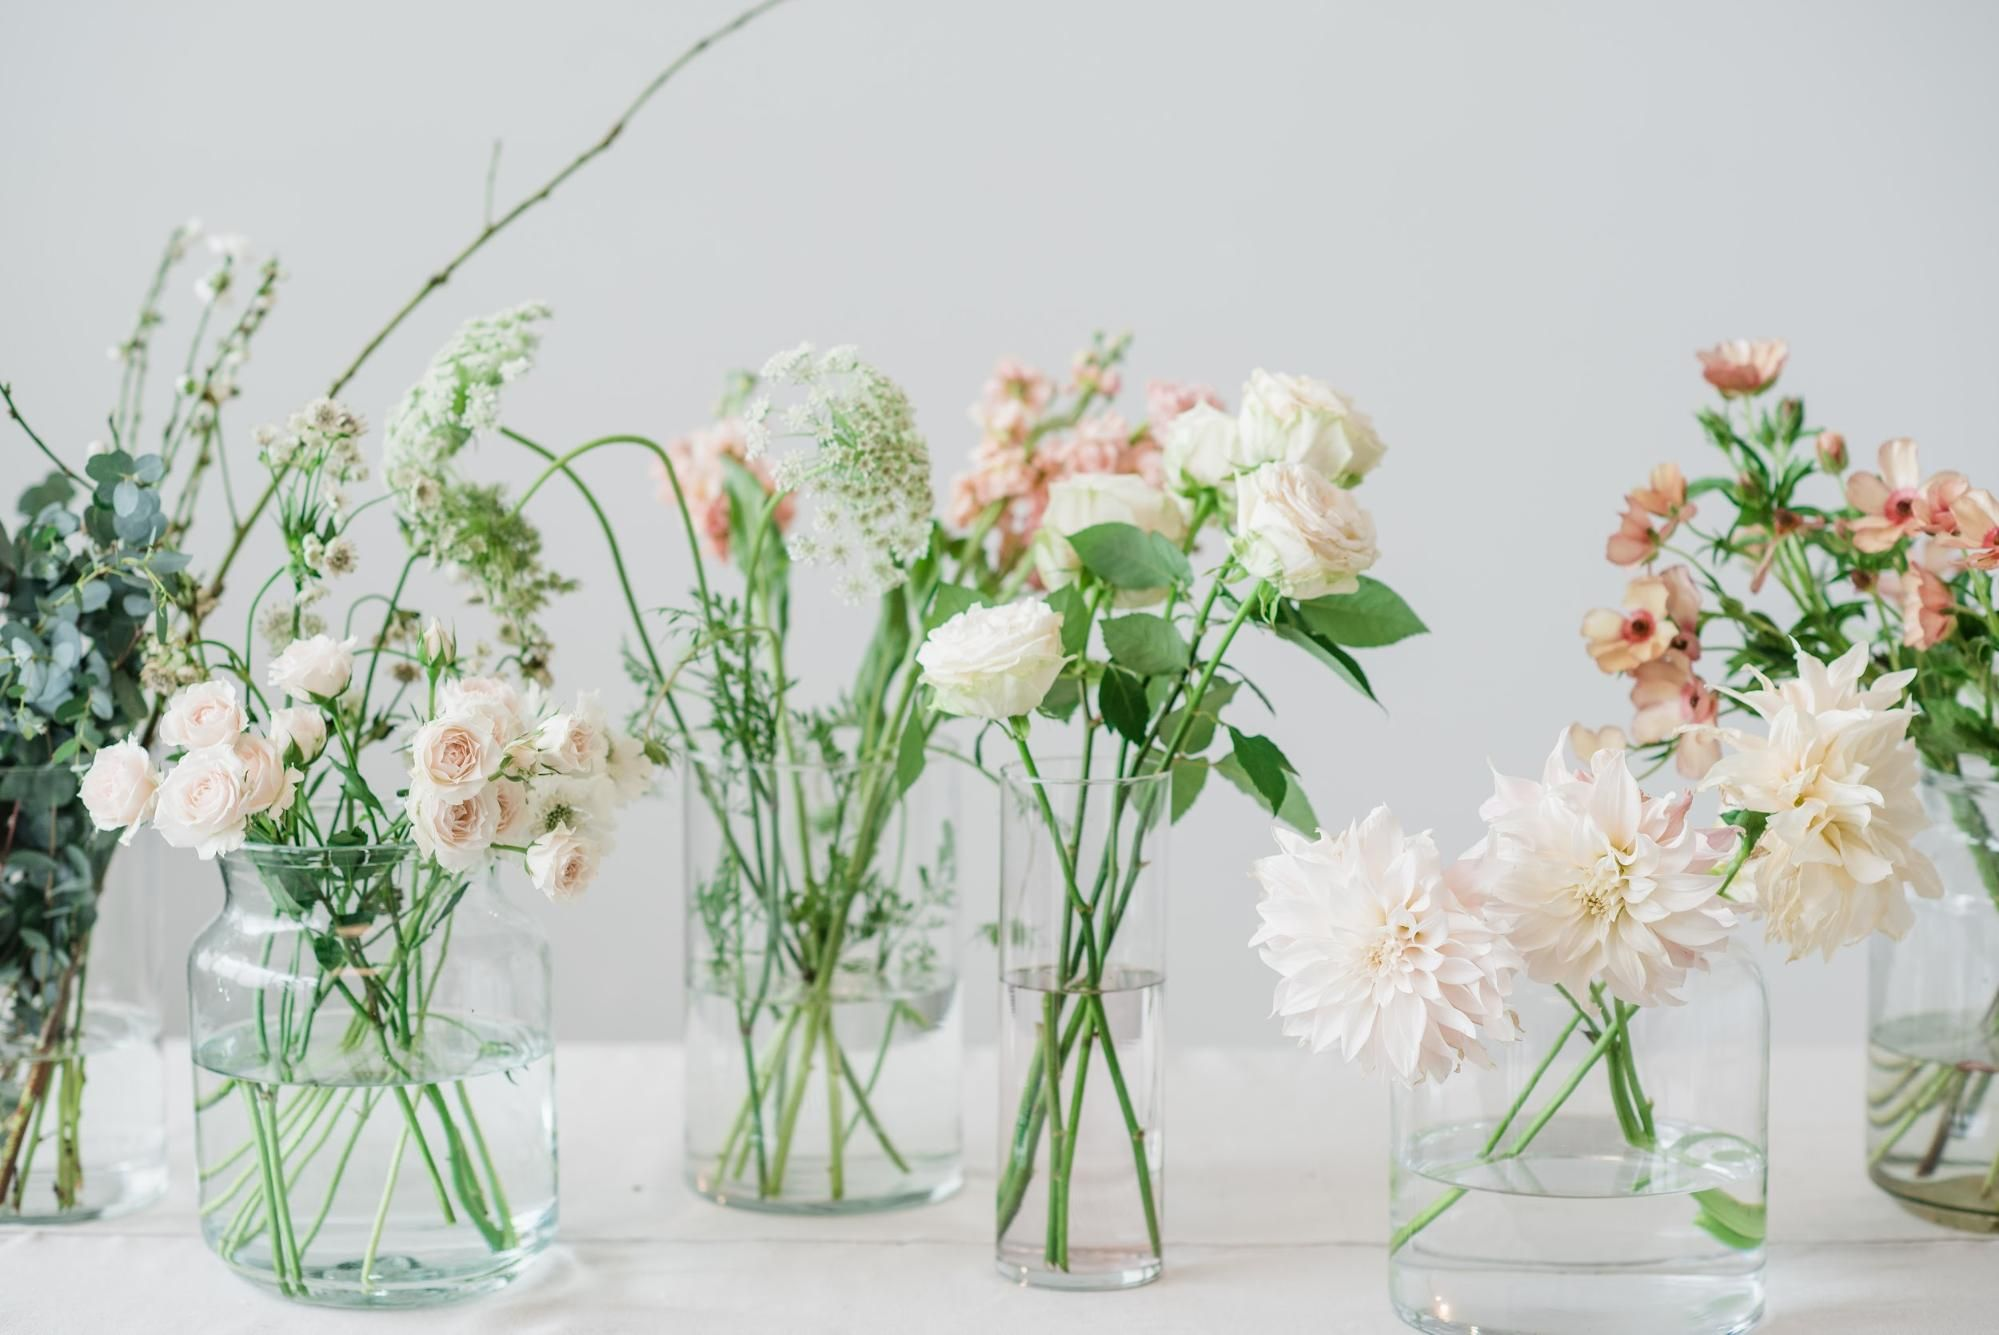 Create Your Own Floral Arrangement Flowers Floral